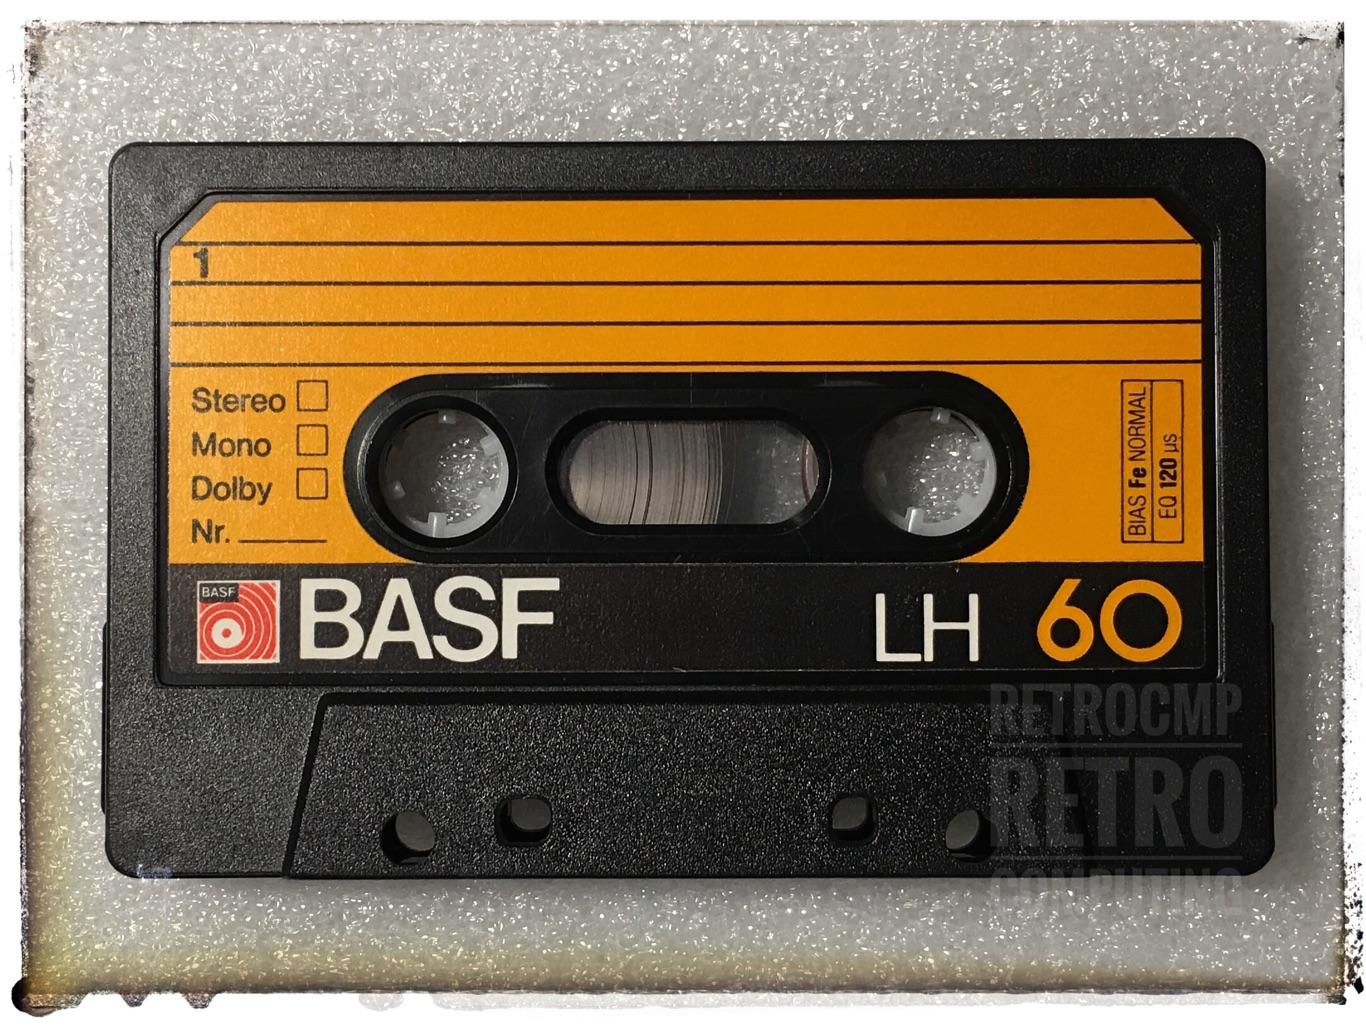 IBM PC/XT / 5150 / Cassette BASIC // retrocmp / retro computing